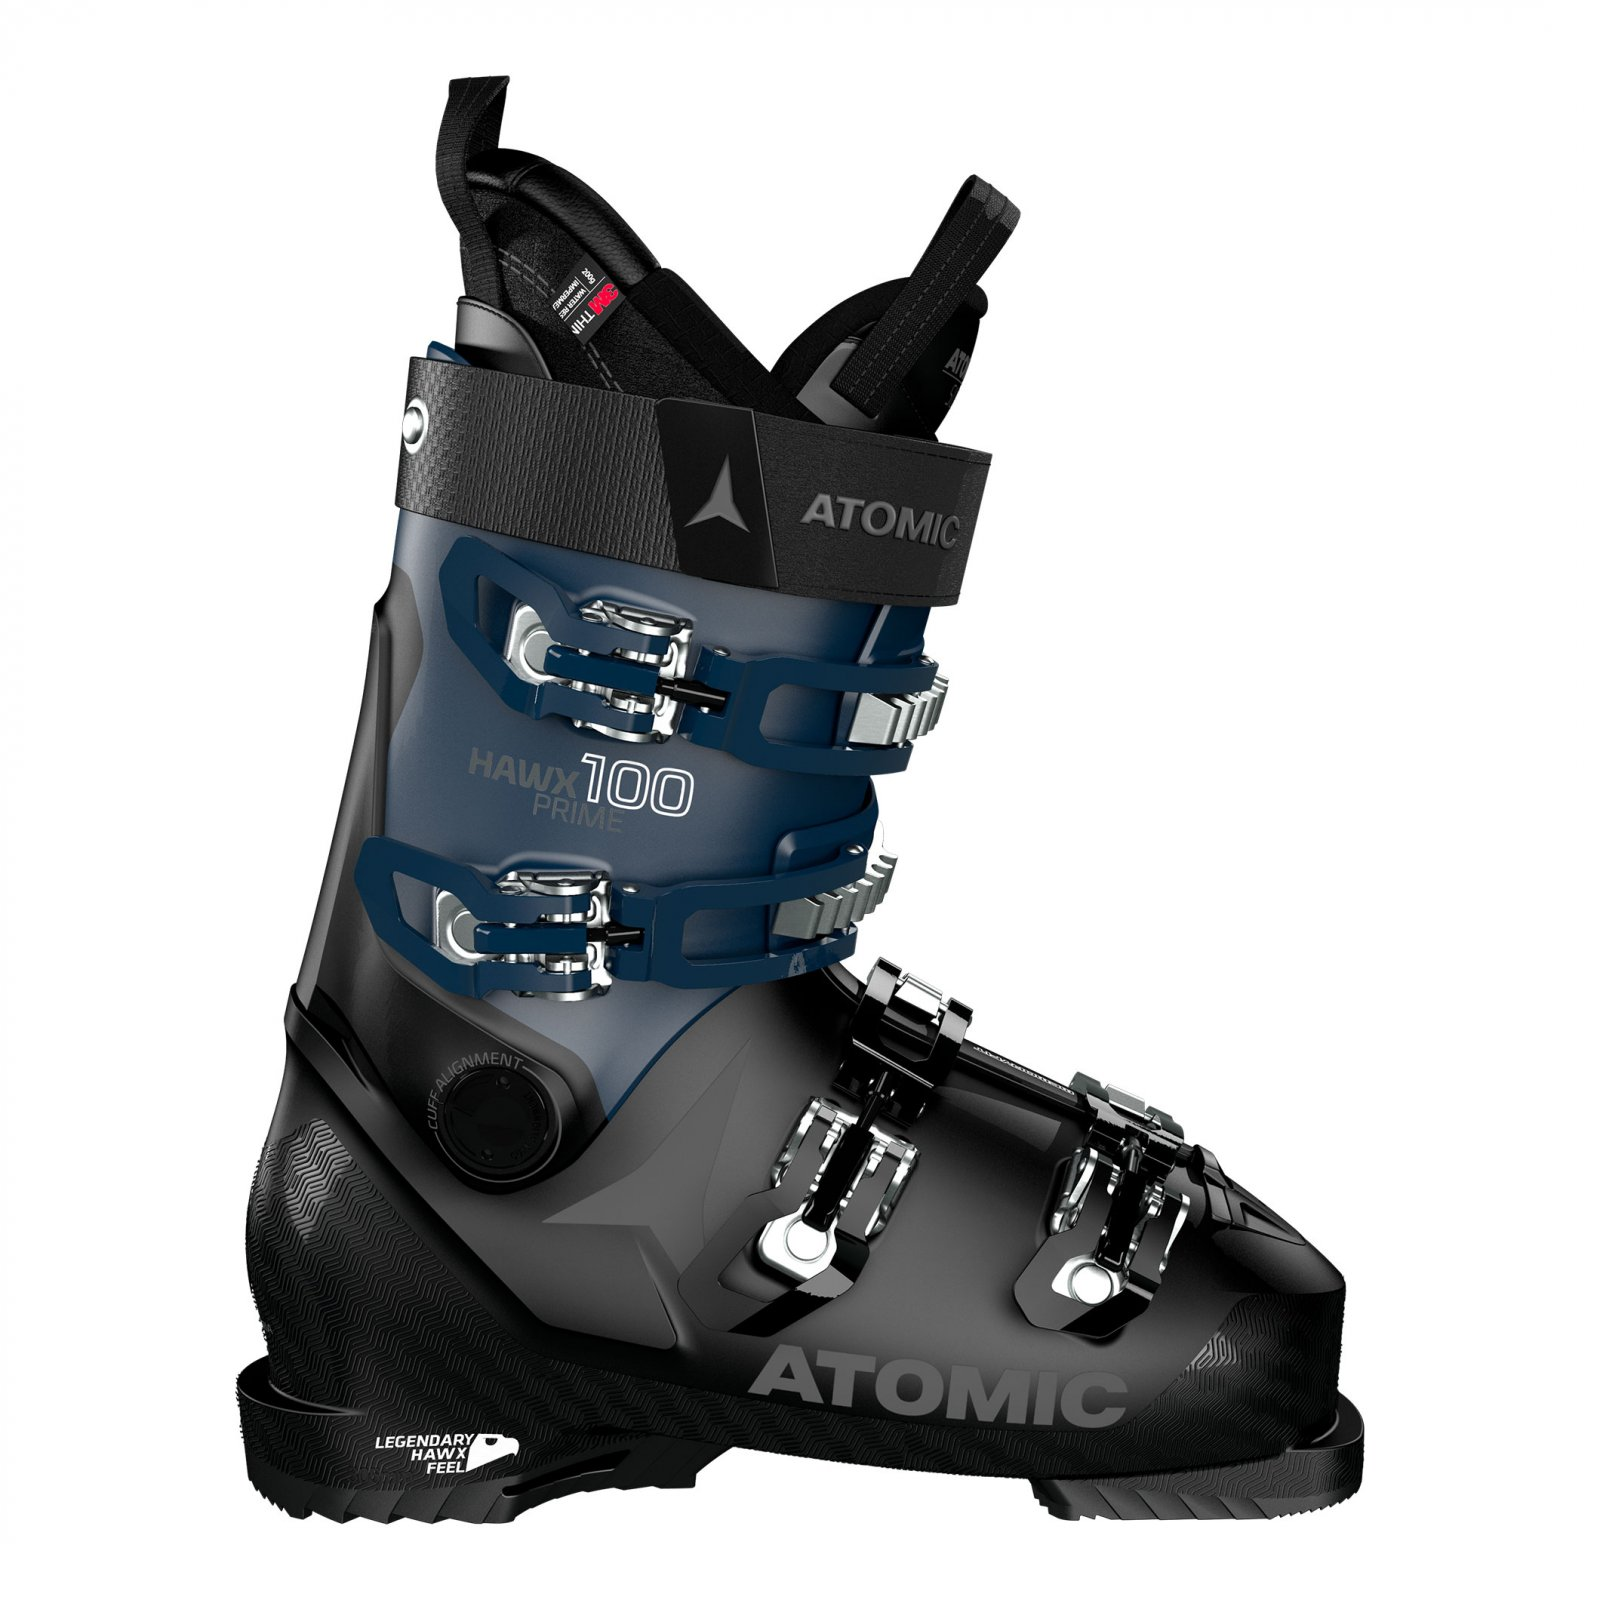 2022 Atomic Hawx Prime 100 Men's Ski Boots